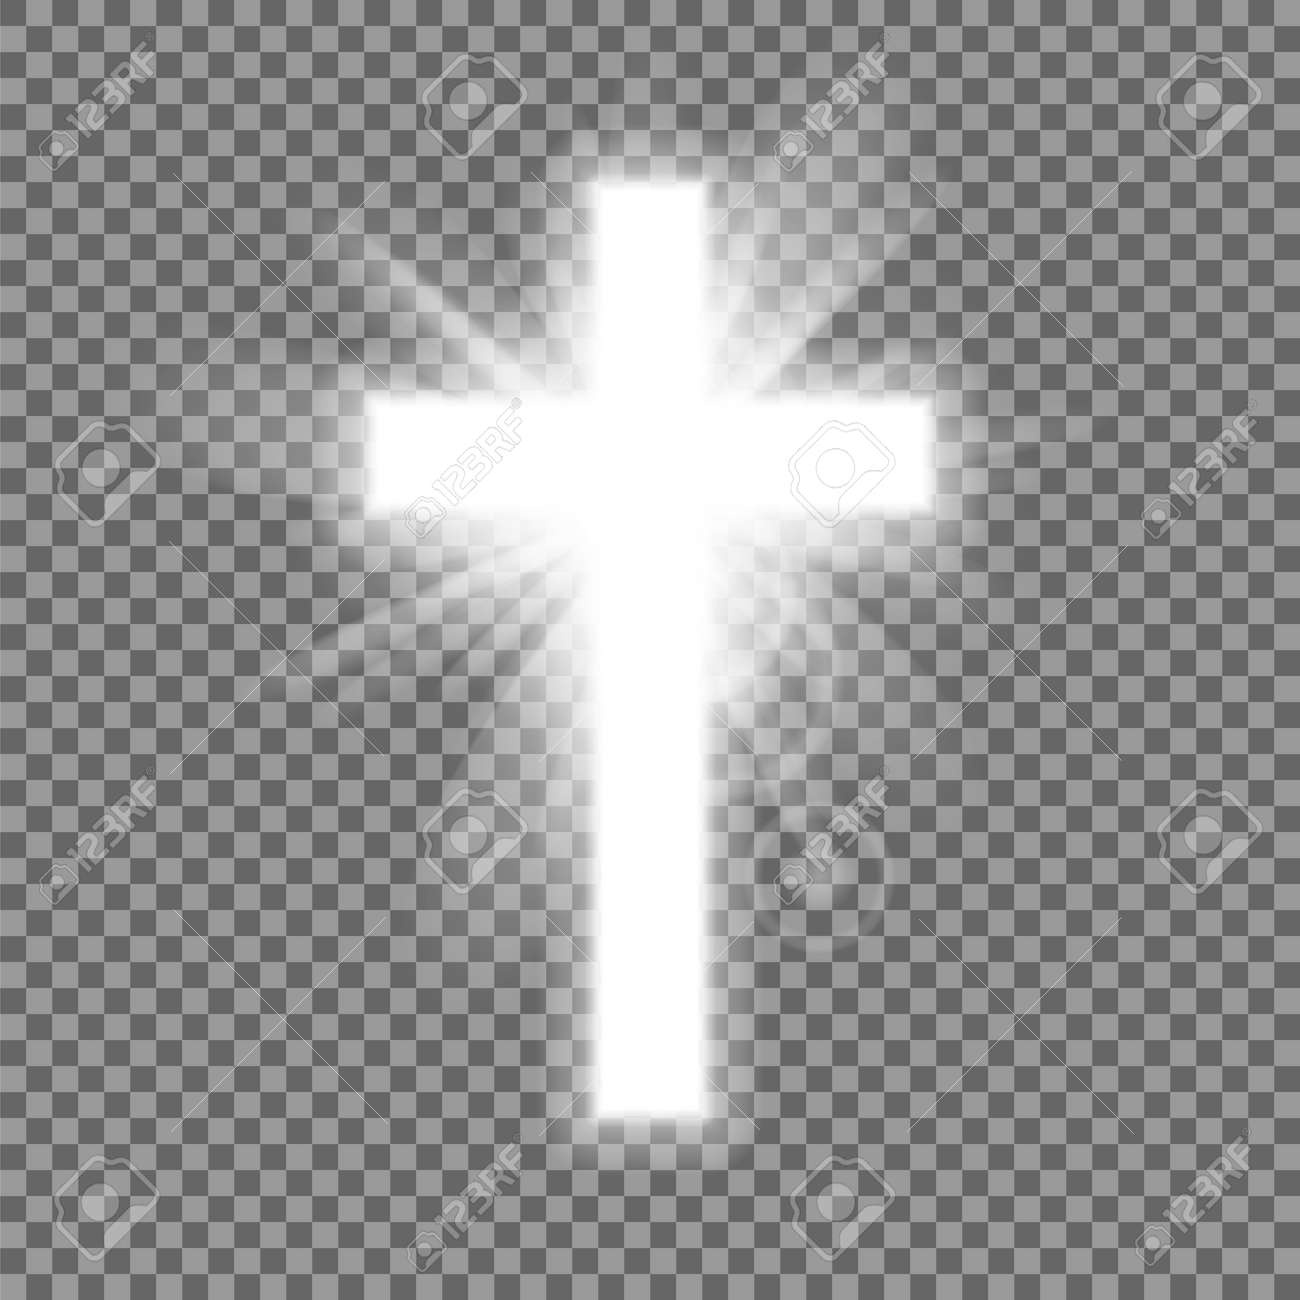 Christian heaven. Holy light glow effect. Vector shine symbol of christianity illustration. Vector illustration. - 164872079